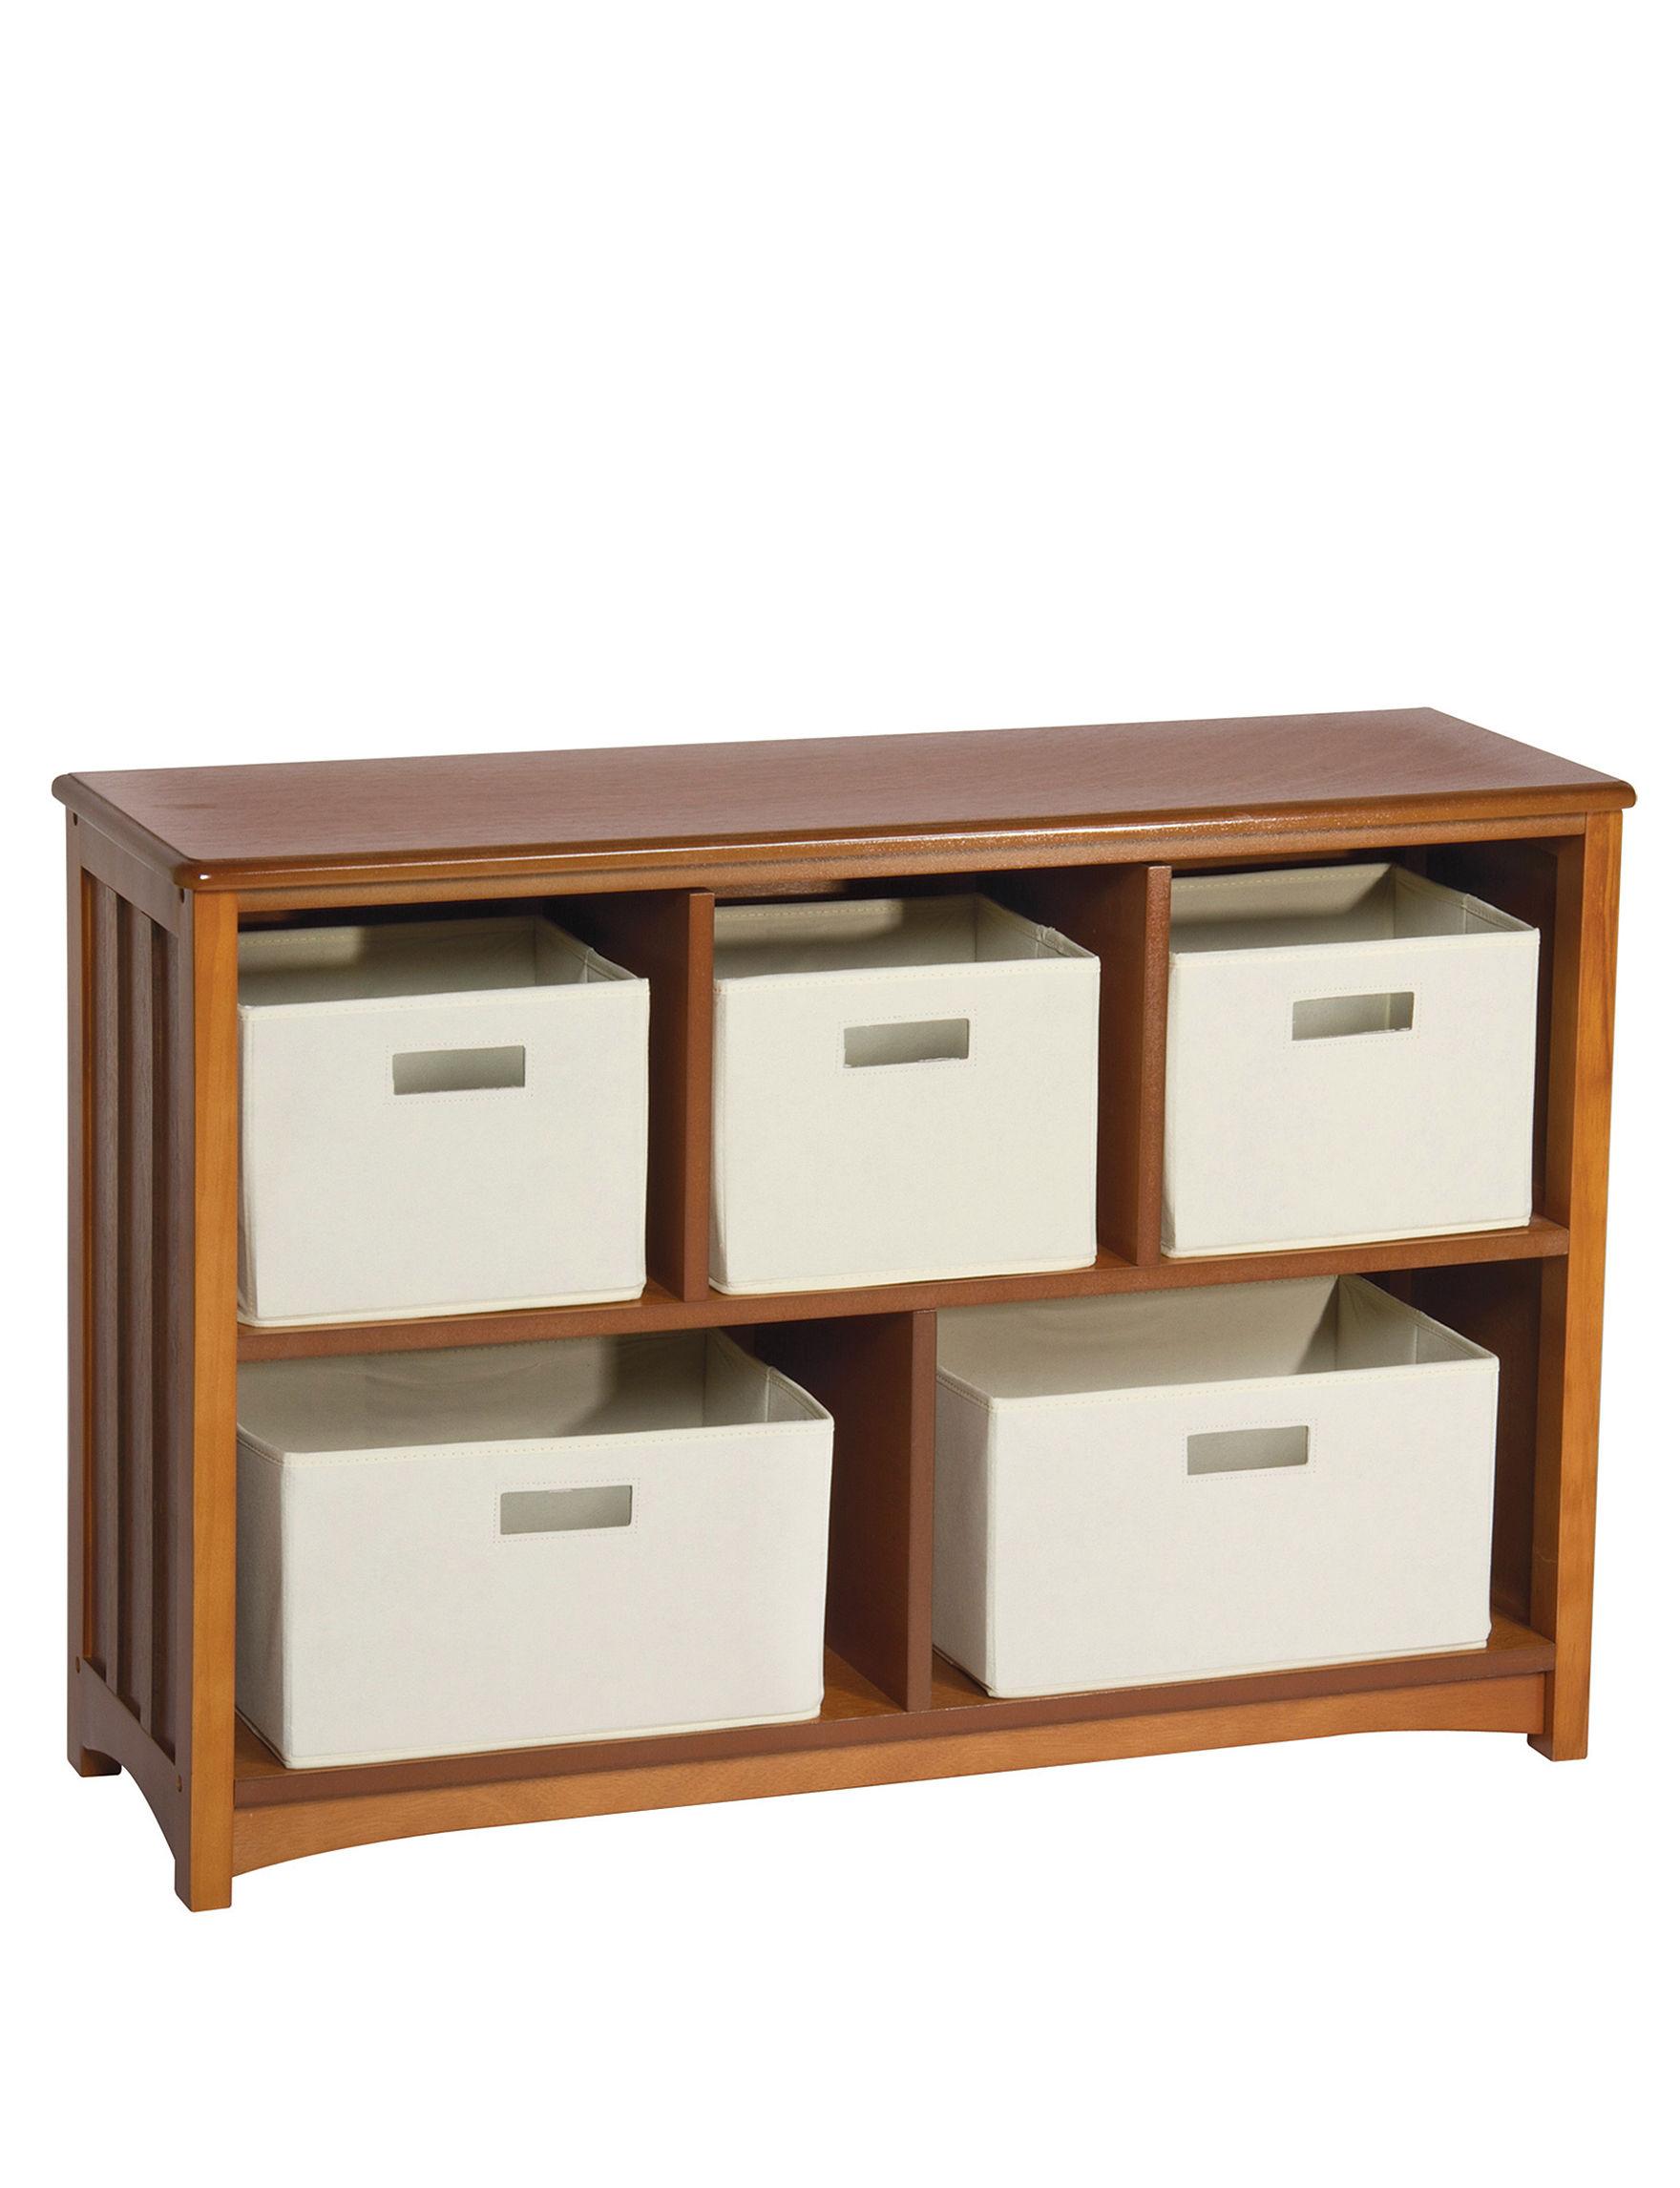 Guide Craft Light Oak Bookcases & Shelves Living Room Furniture